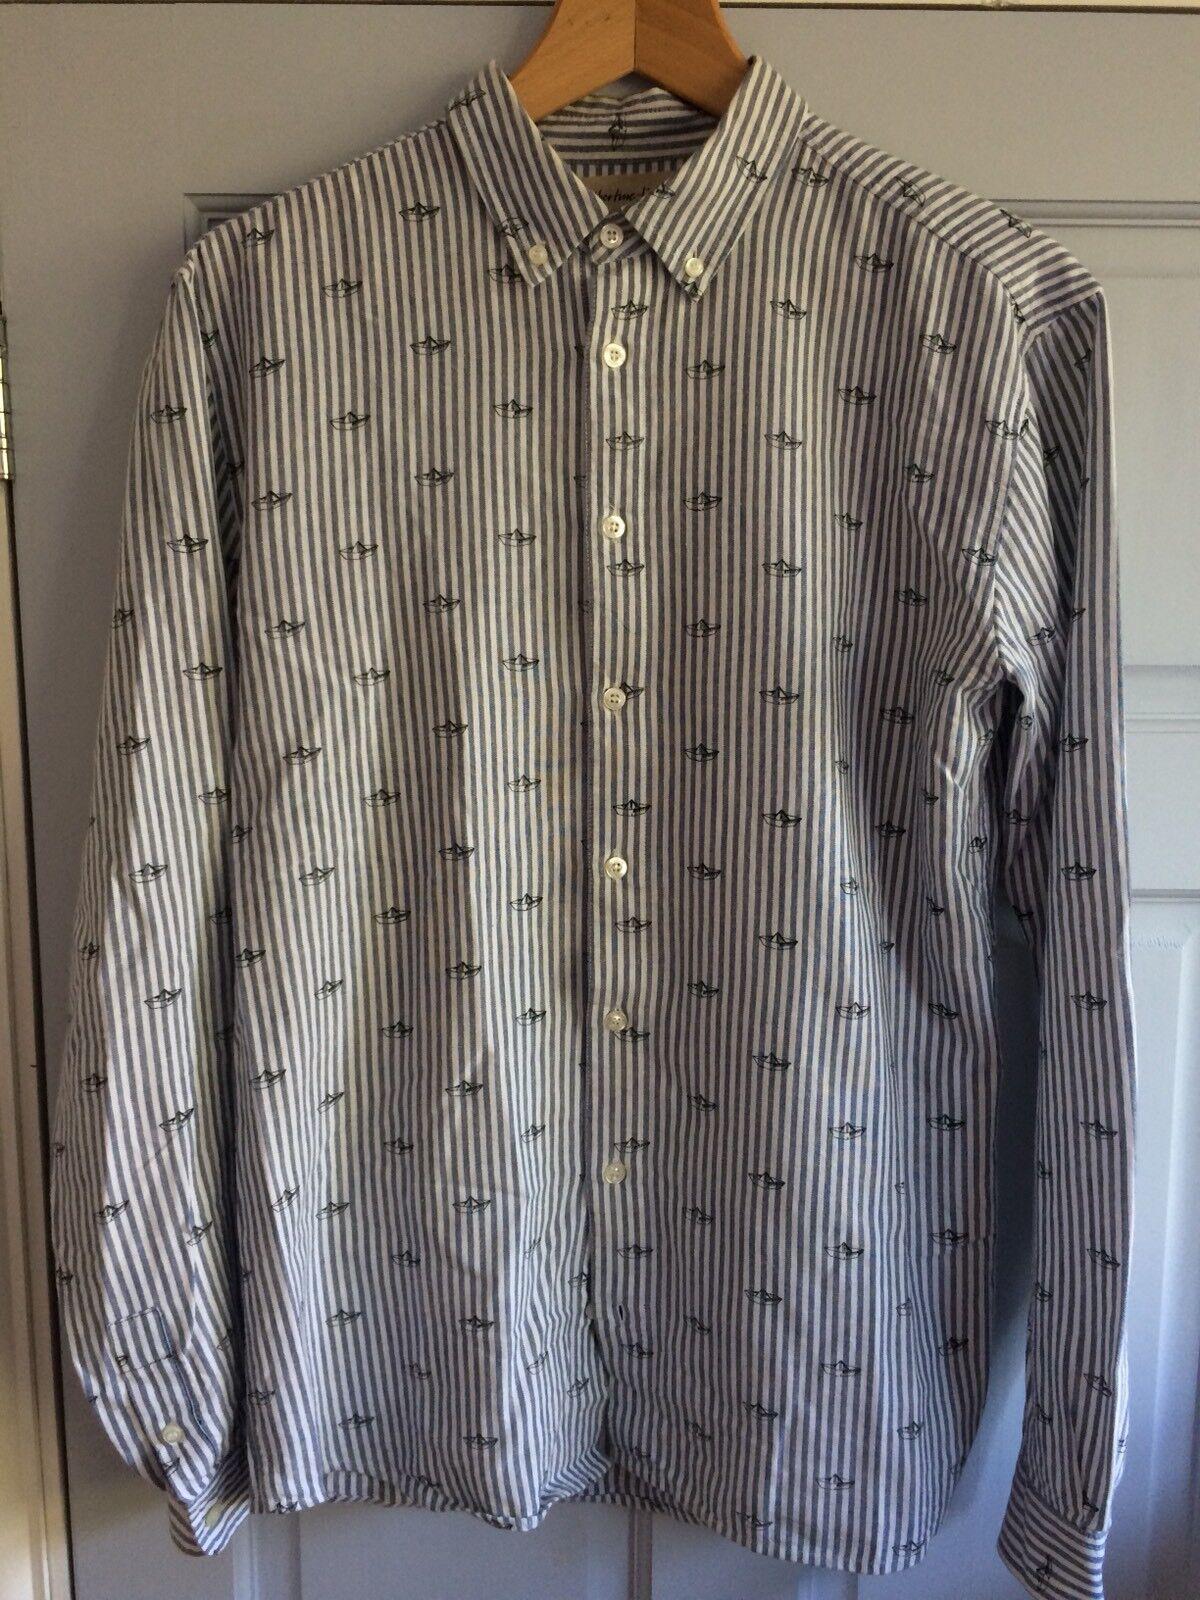 Libertine Libertine Boat Printed Striped Button Down Oxford Shirt